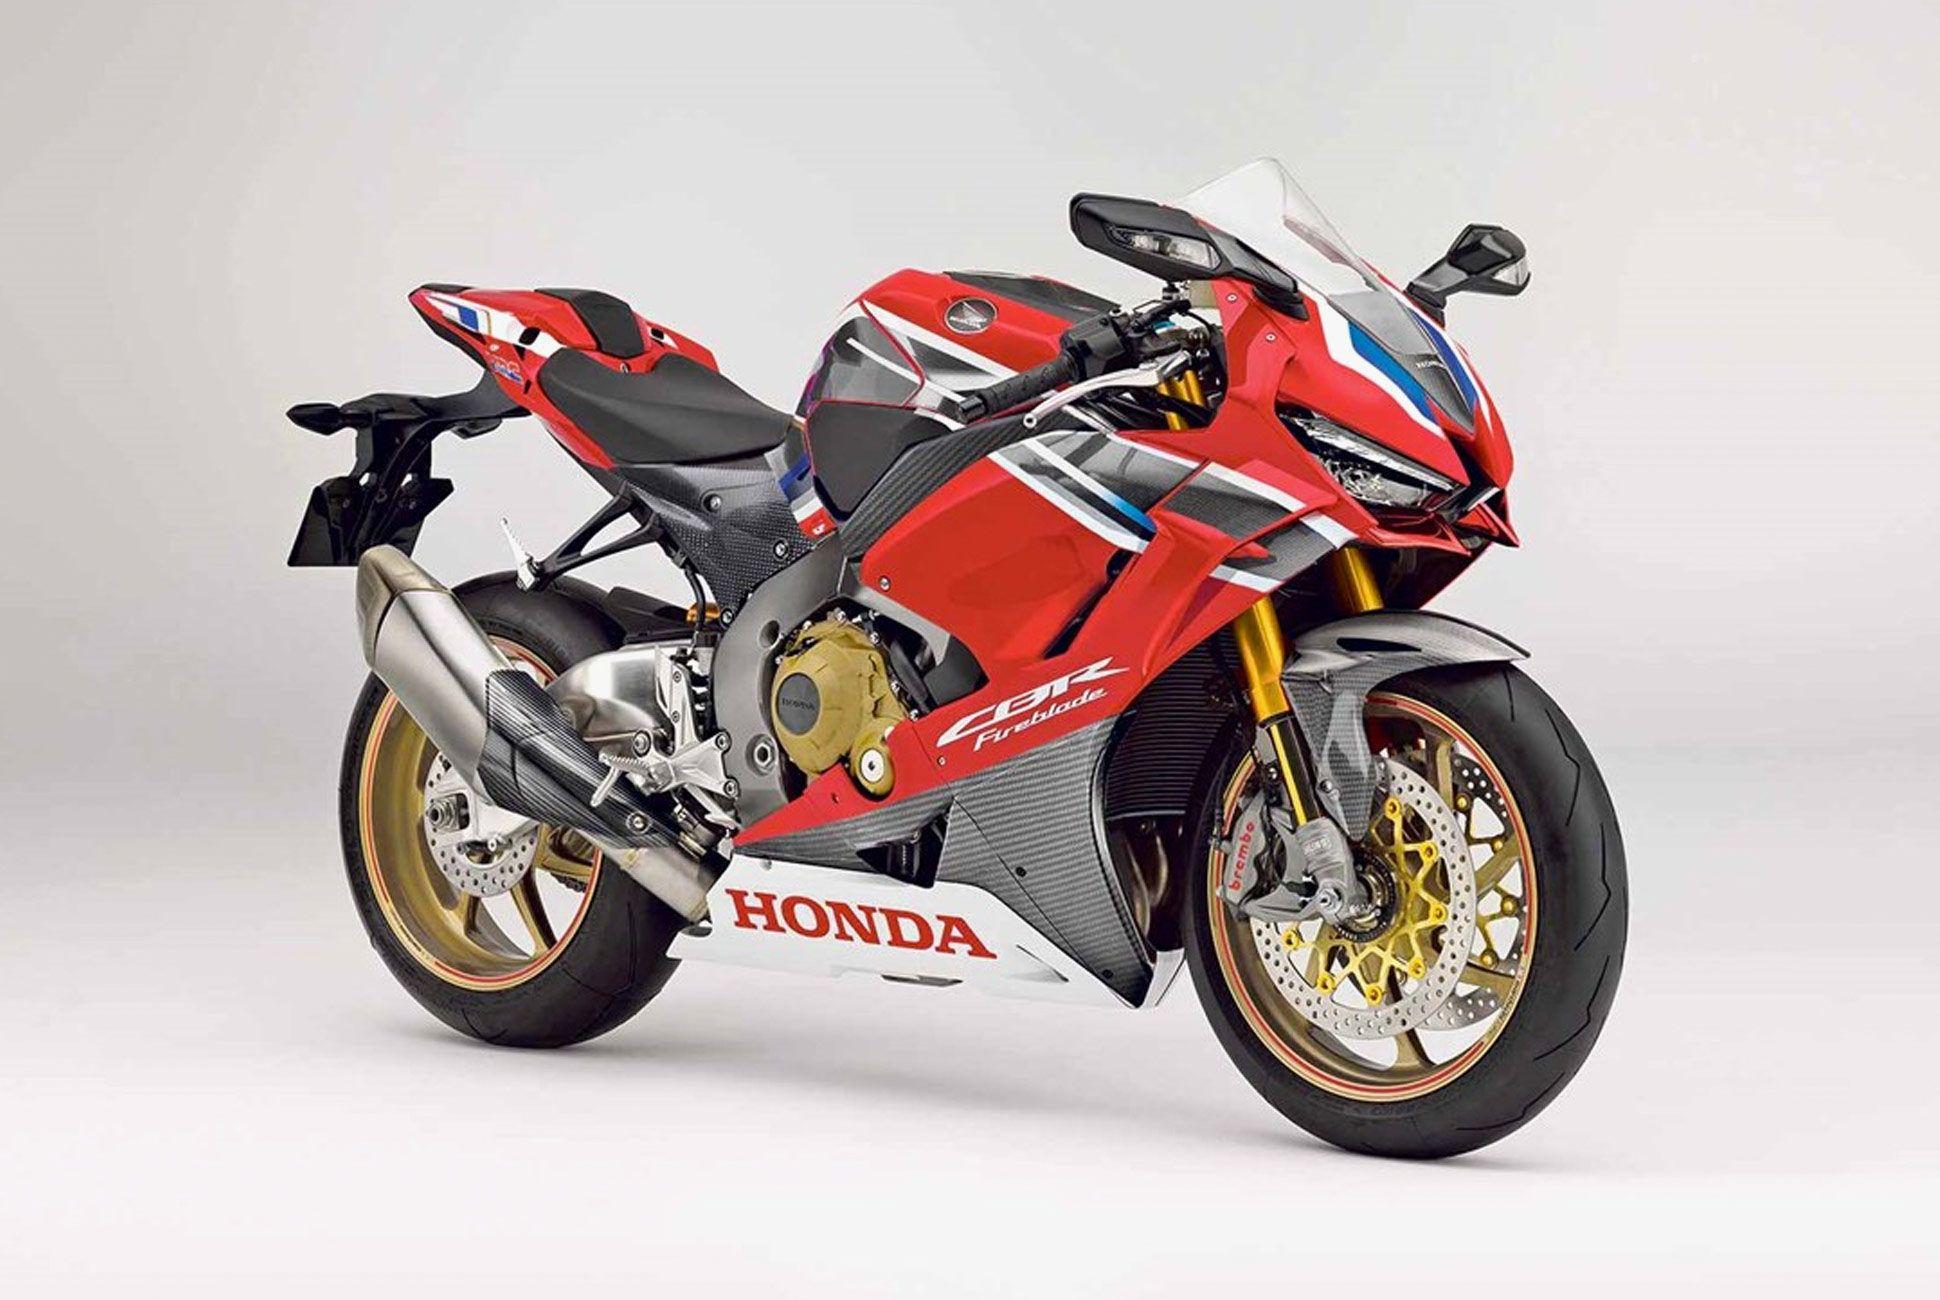 Honda CBR1000RR Honda fireblade, Honda sport bikes, Honda